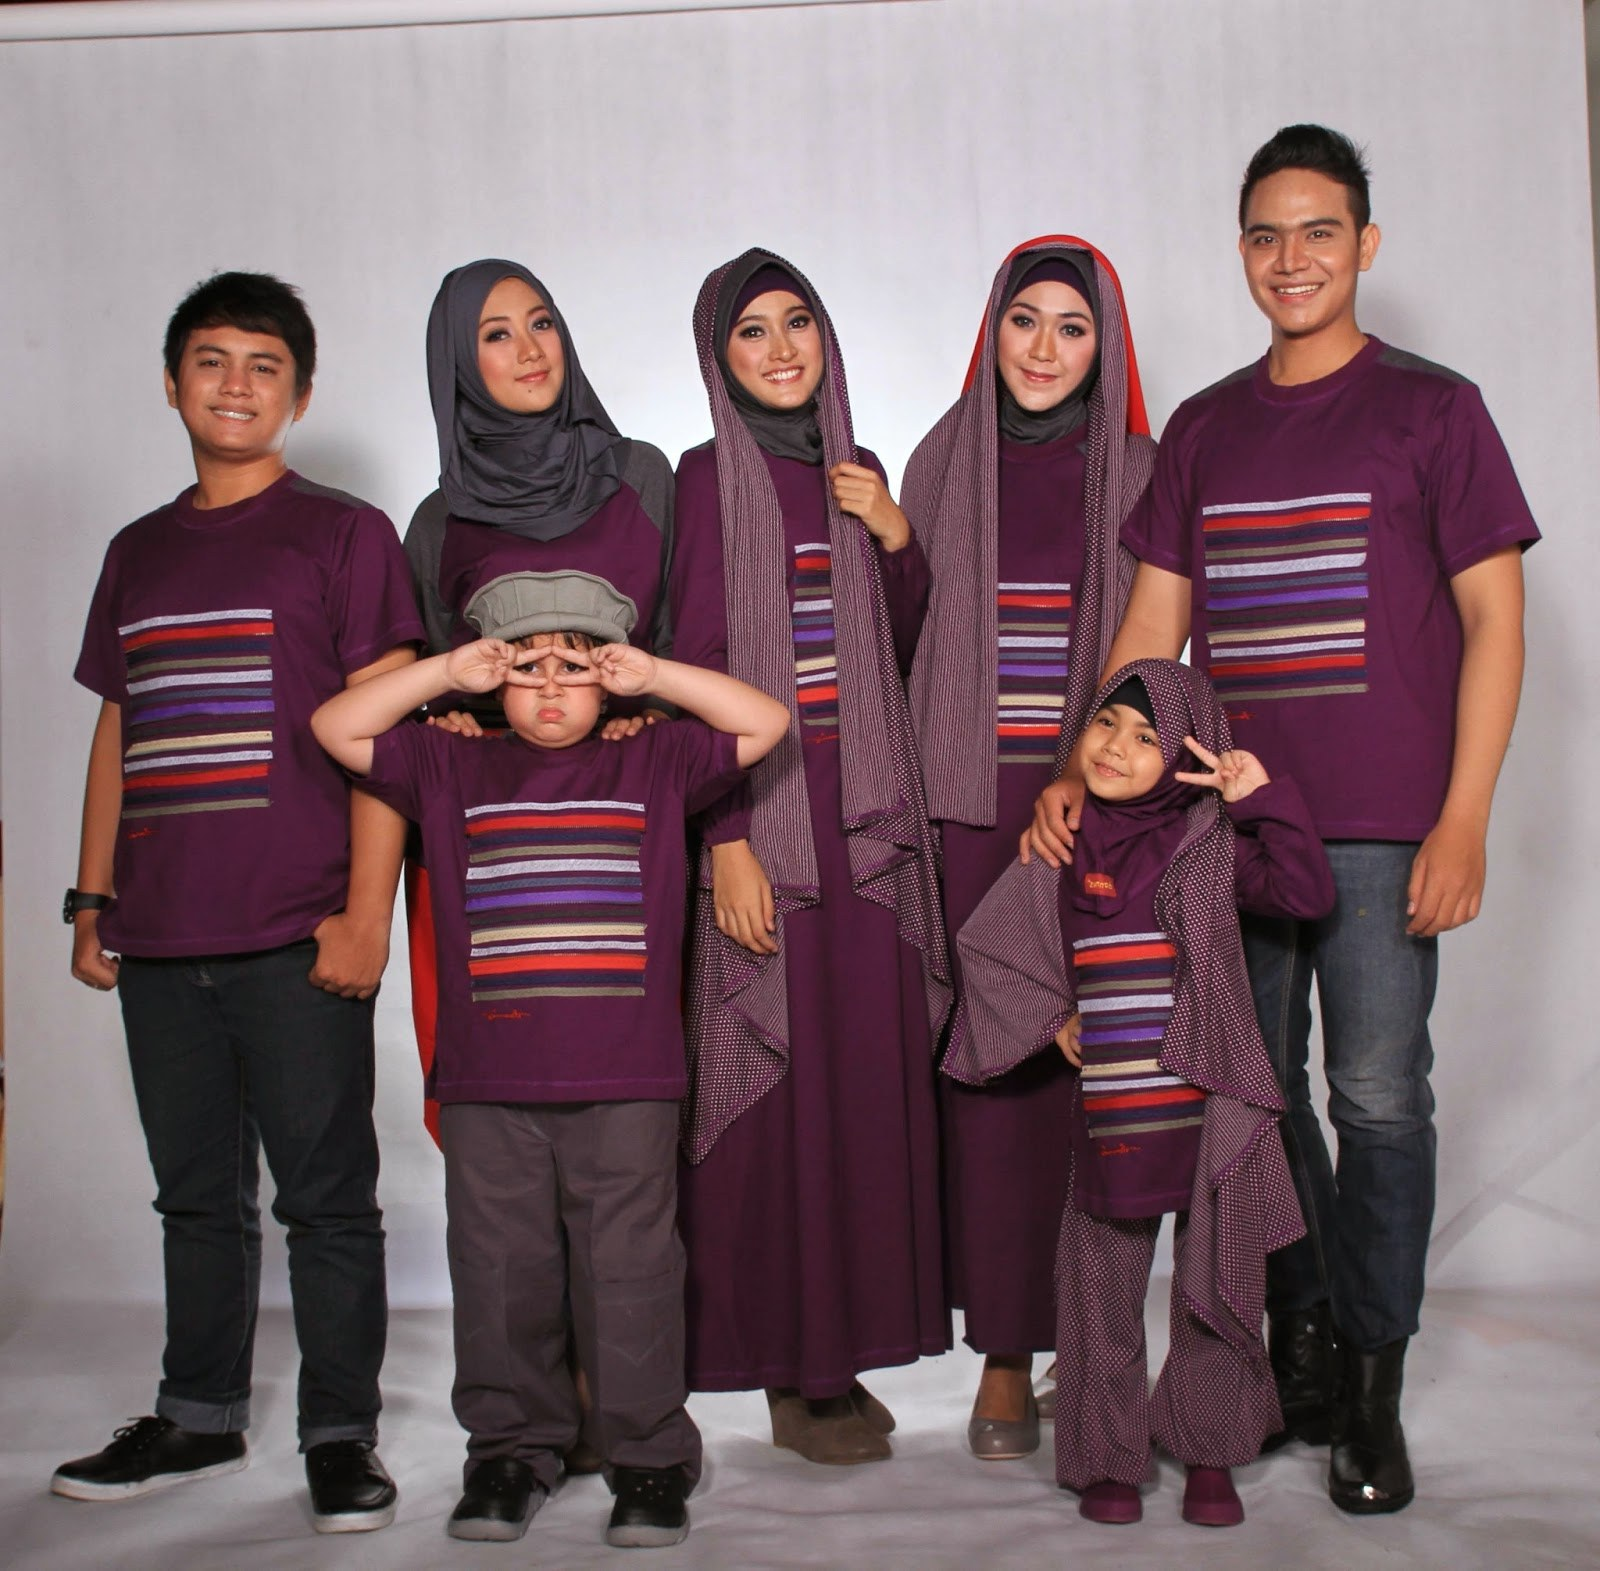 Design Baju Lebaran Putih Keluarga 87dx Model Baju Keluarga Untuk Hari Raya Lebaran 2018